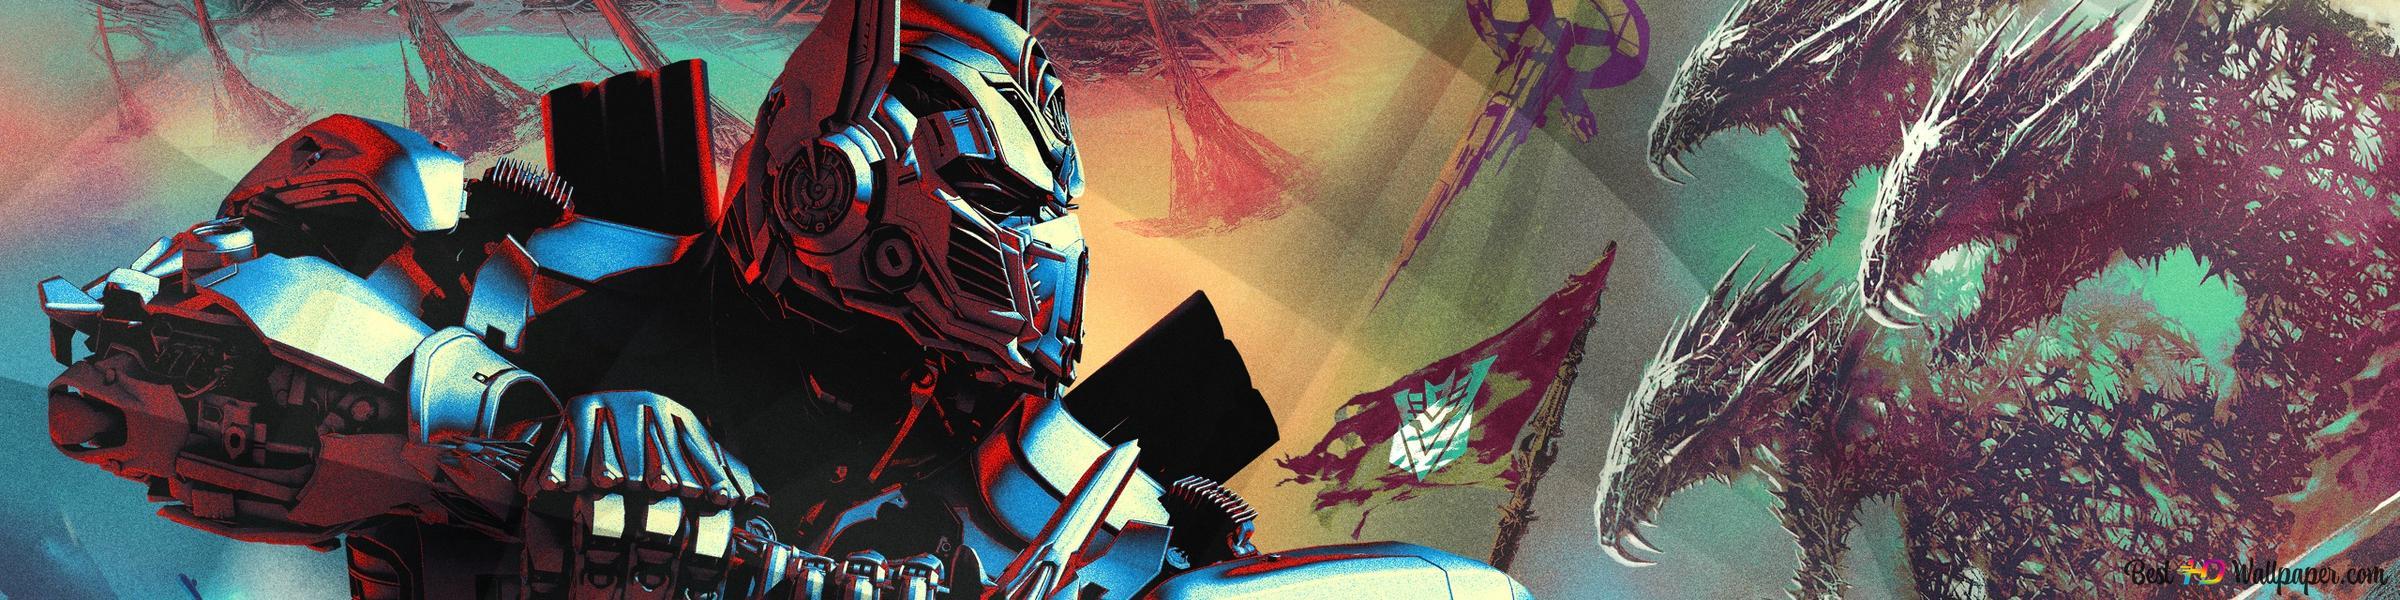 Transformers The Last Knight Optimus Prime Hd Wallpaper Download